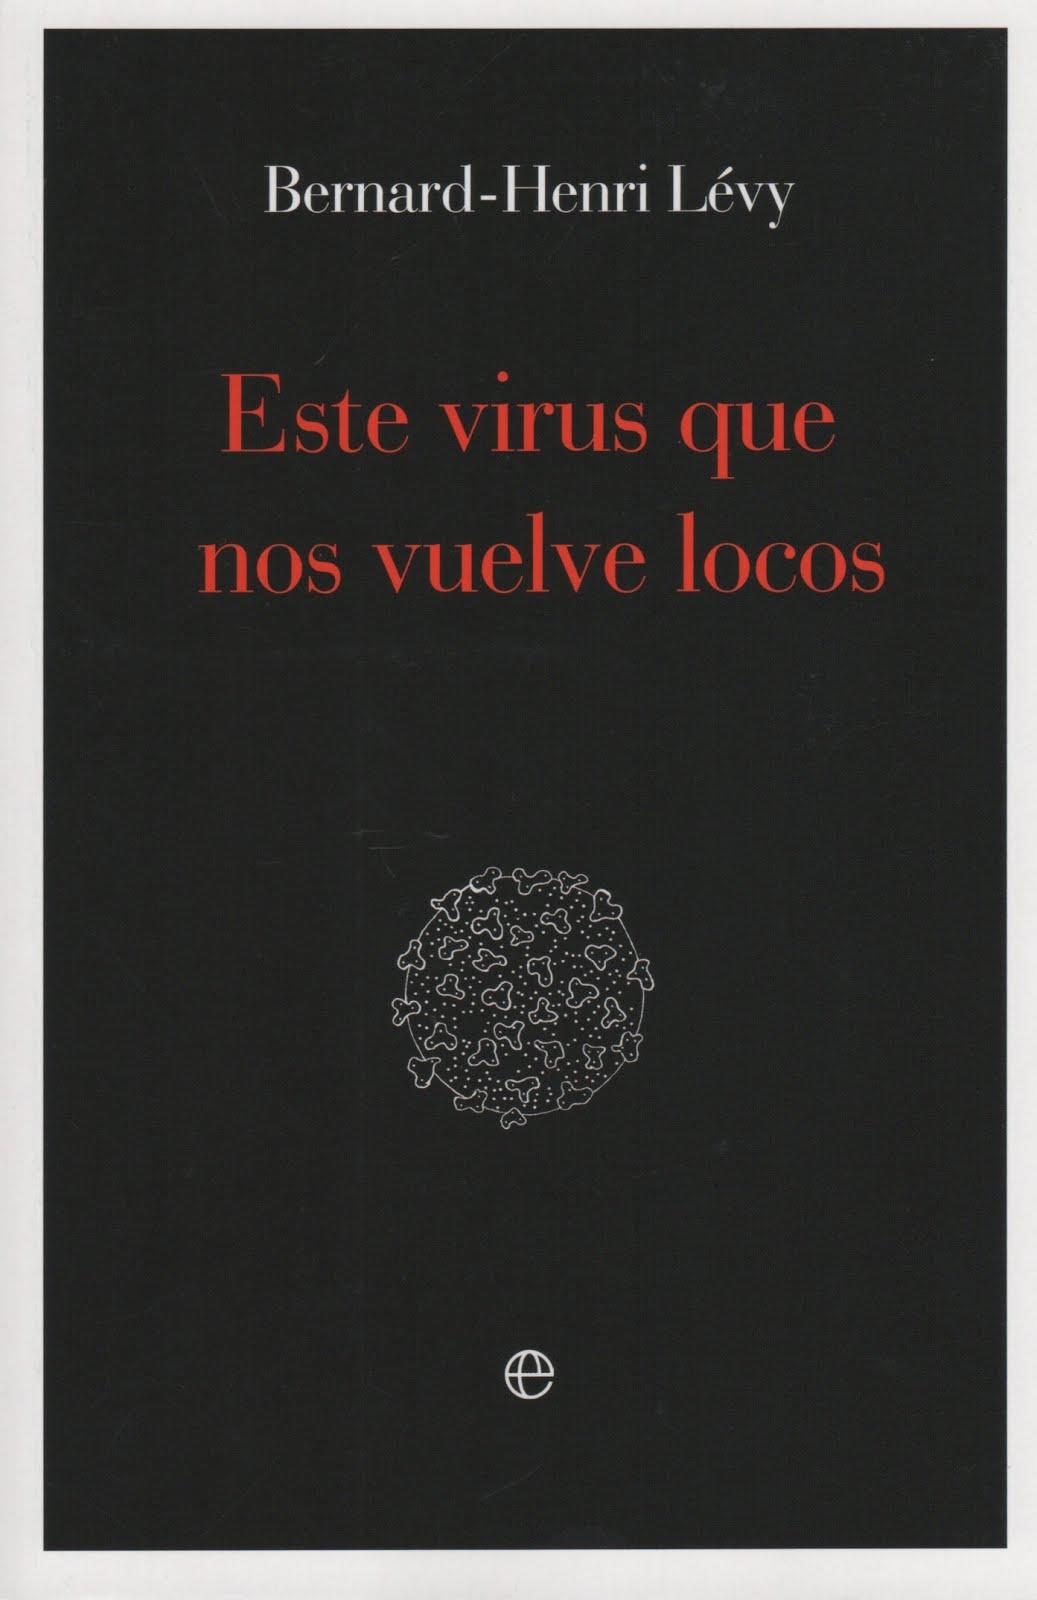 Bernard-Henri Lévy (Este virus que nos vuelve locos)